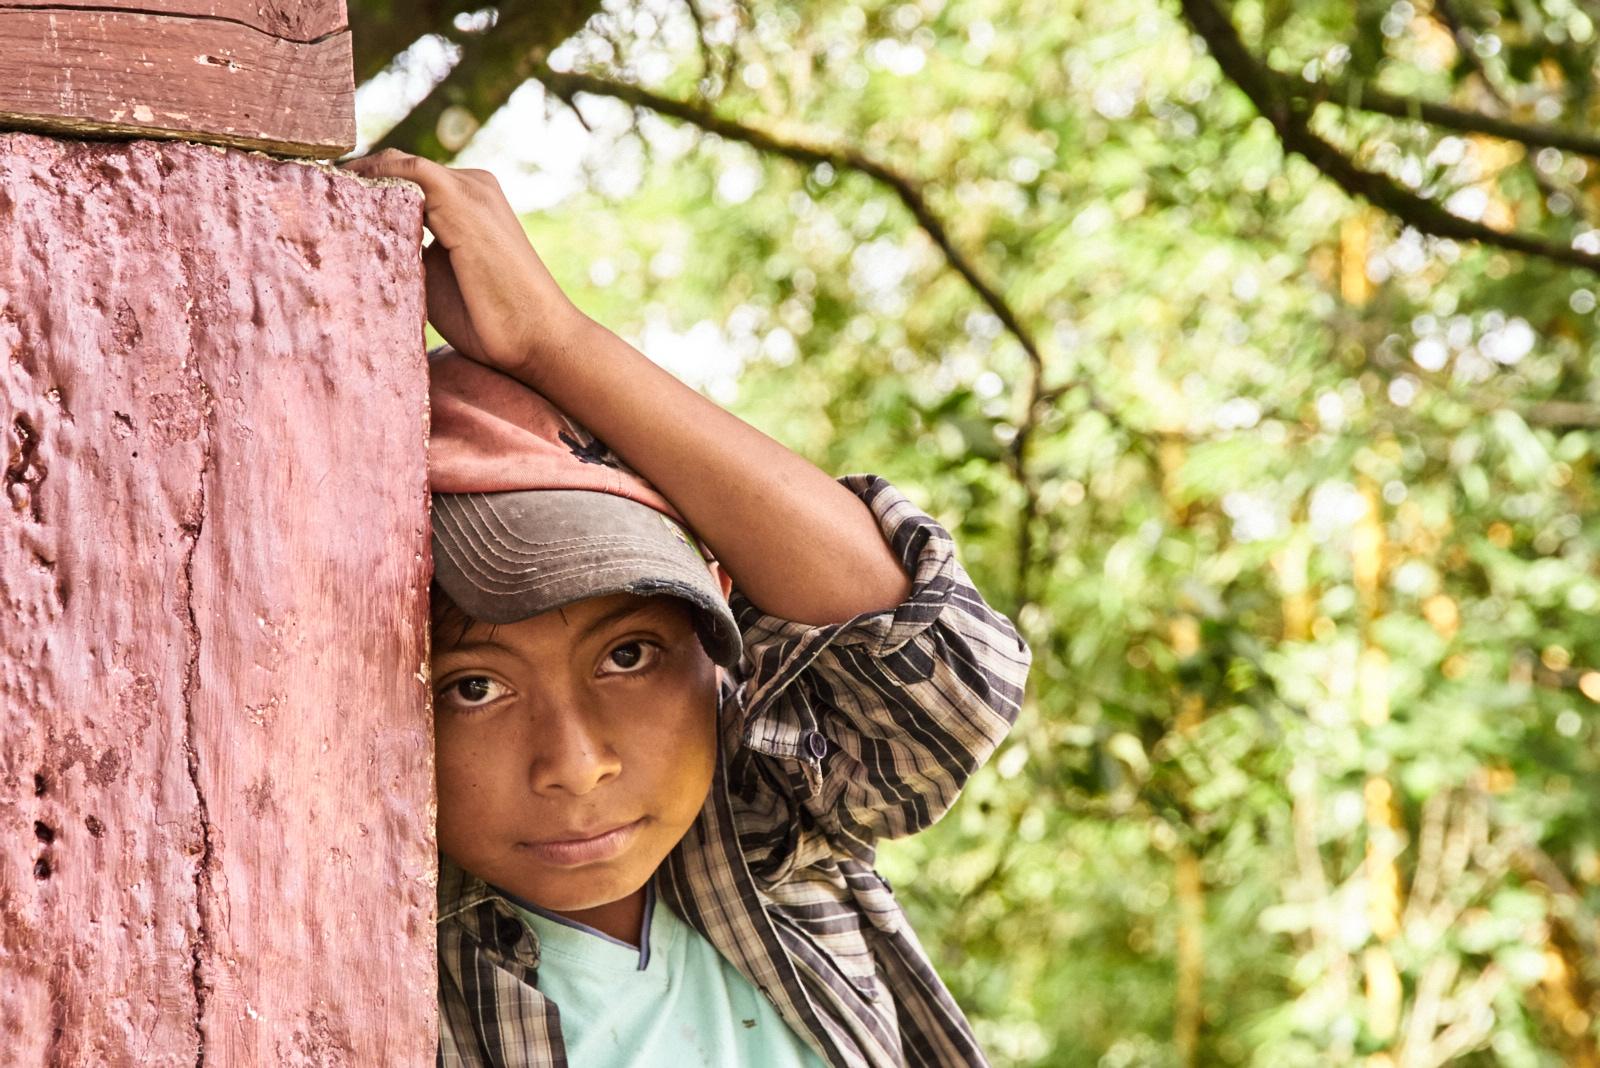 Kids in Nicaragua.